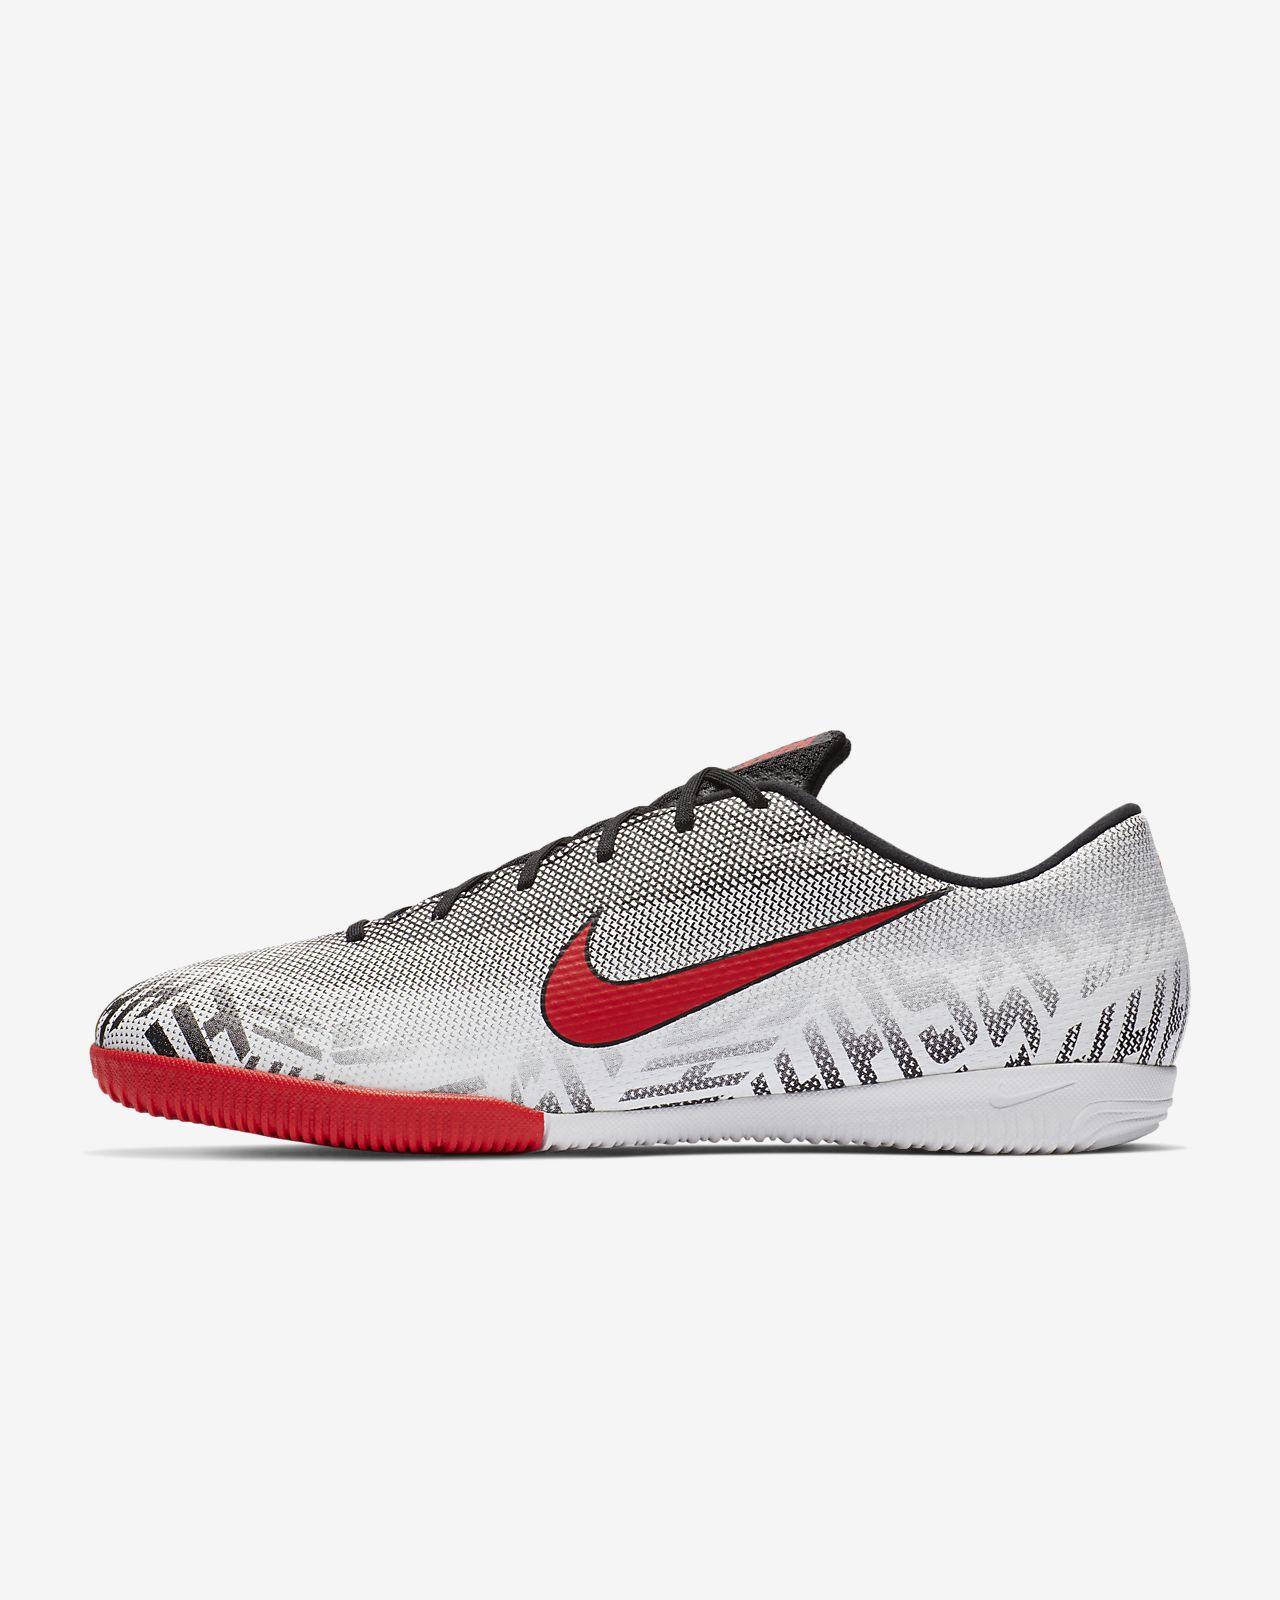 ad71702f8fd ... Calzado de fútbol para cancha cubierta Nike Mercurial Vapor XII Academy  Neymar Jr